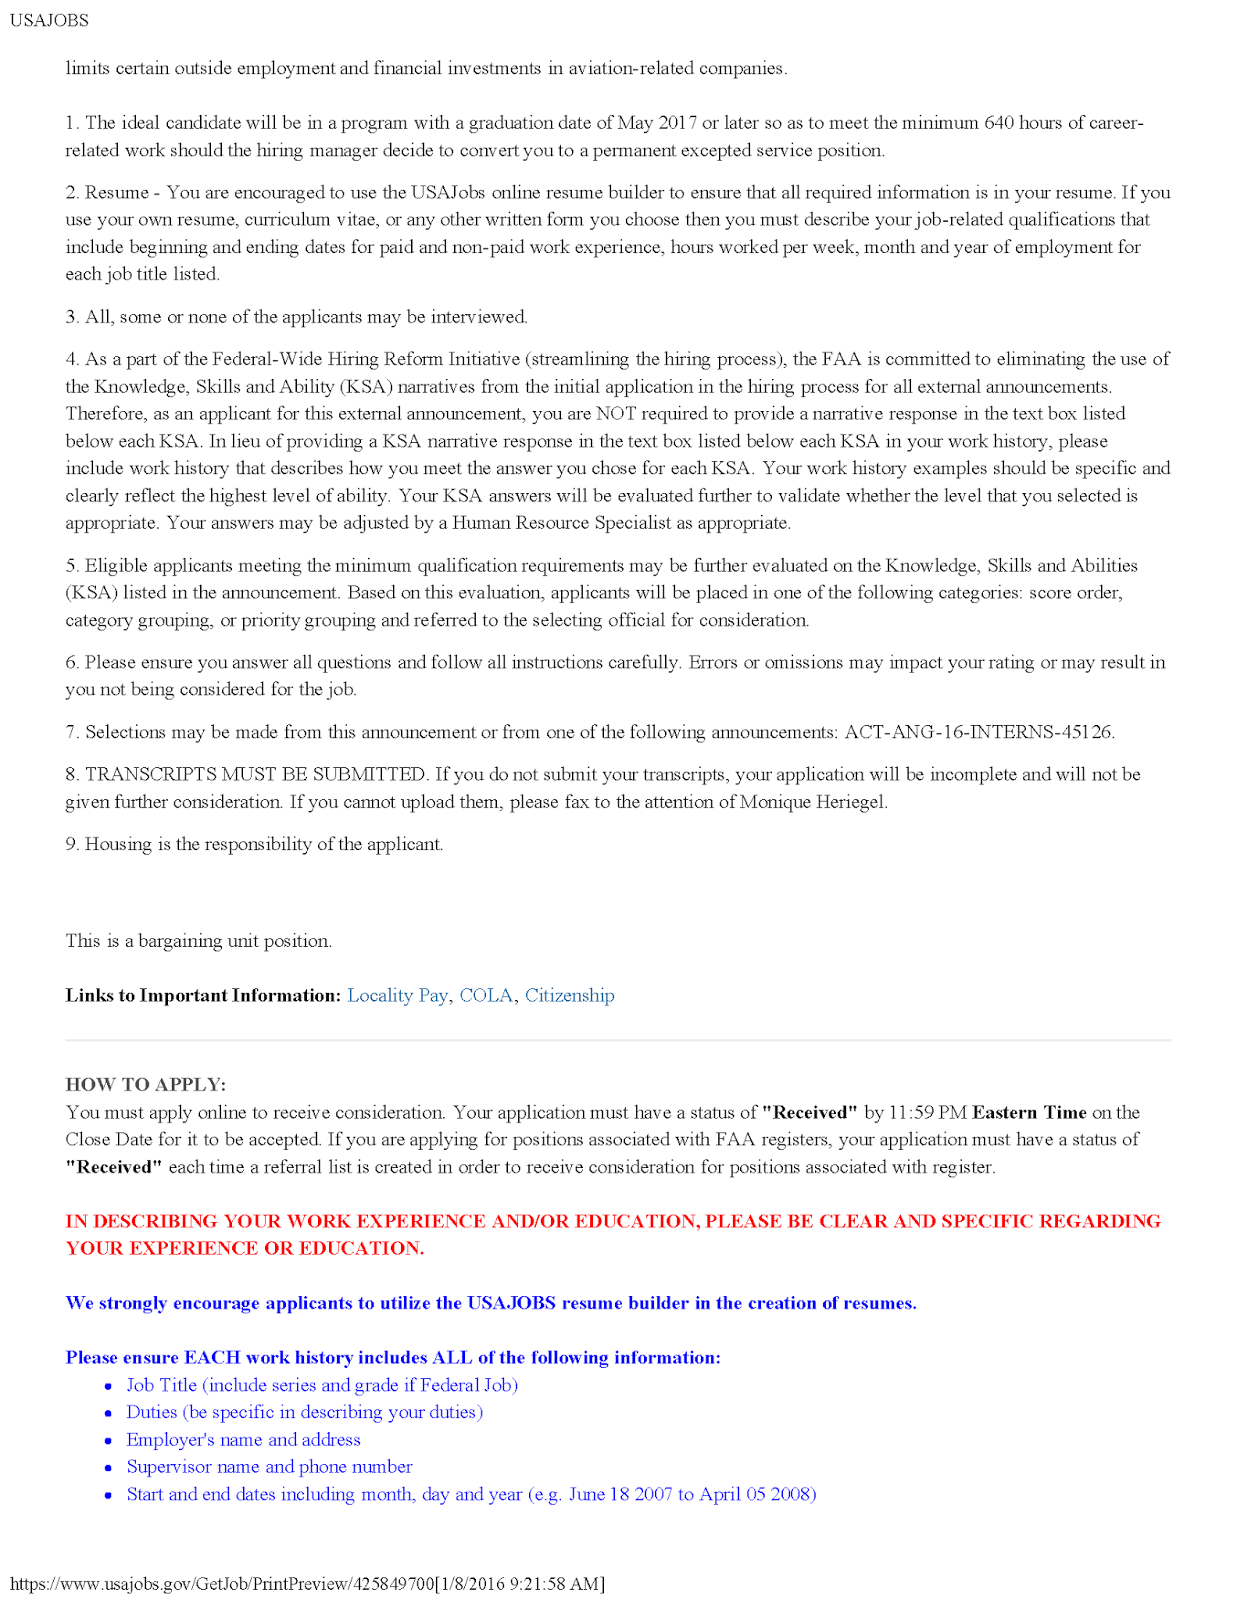 Pathway Internship Program - Job Description | Purdue IE Undergrad